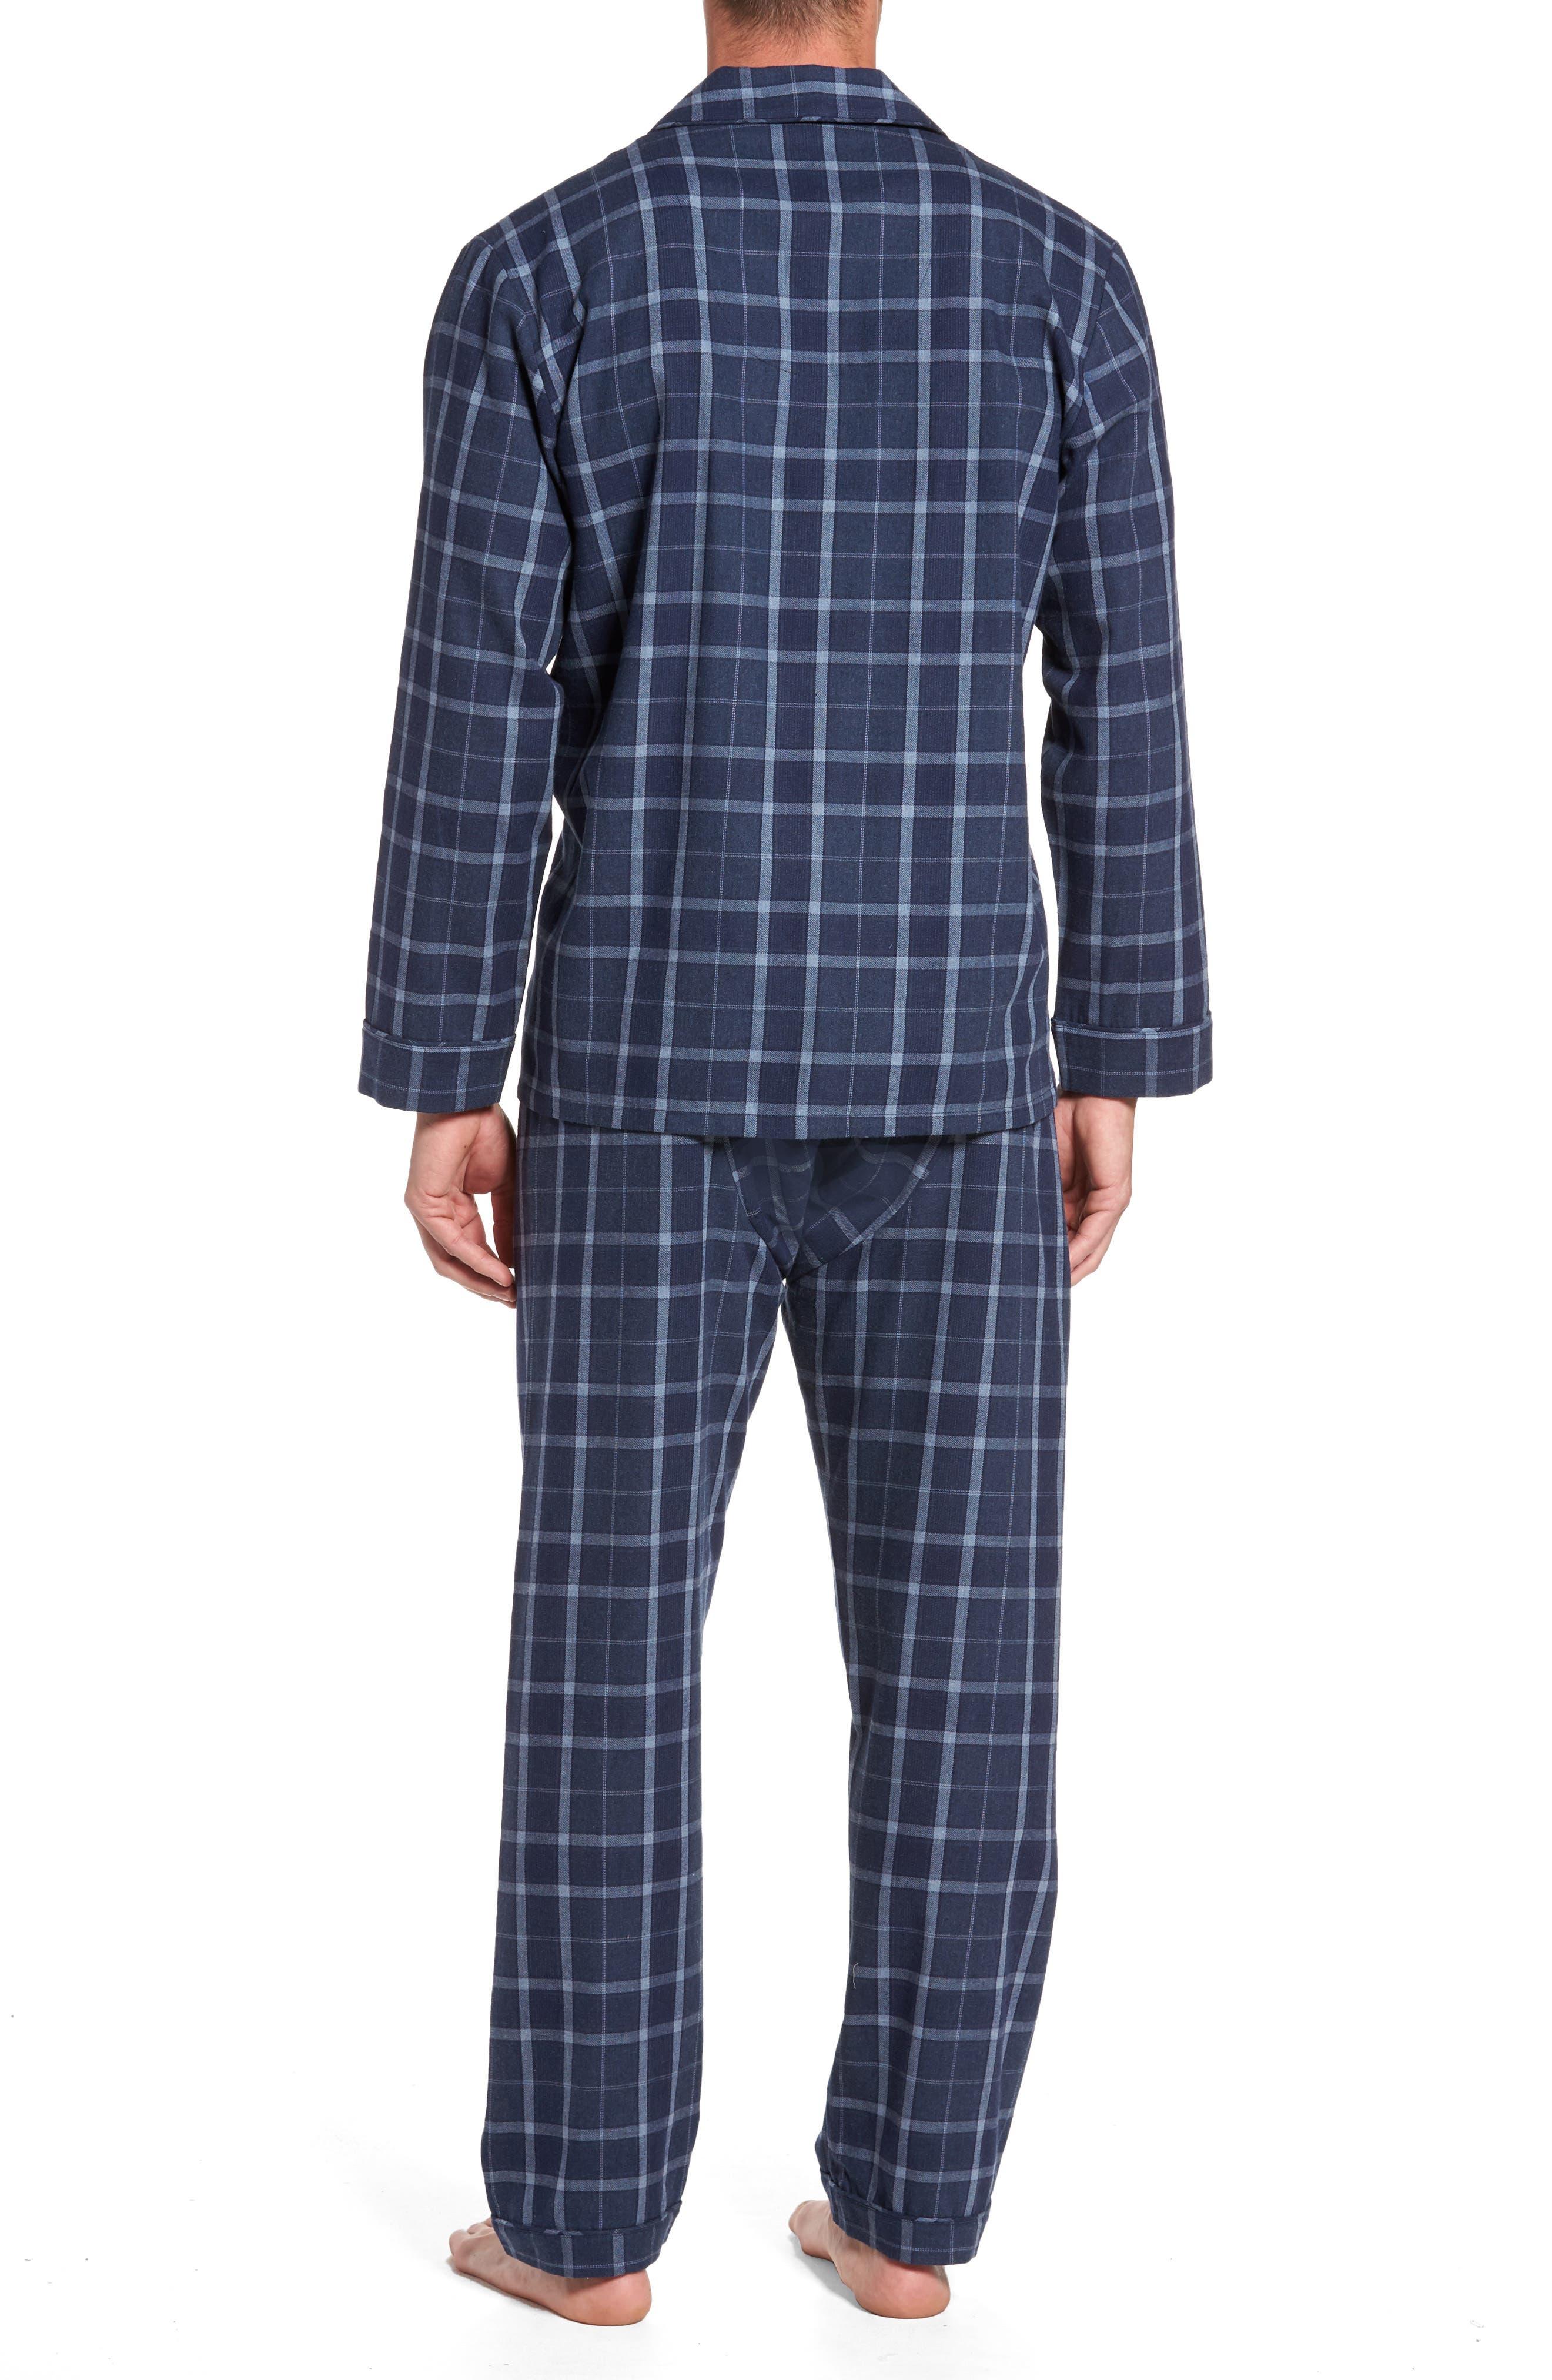 Guiness Plaid Pajama Set,                             Alternate thumbnail 2, color,                             400